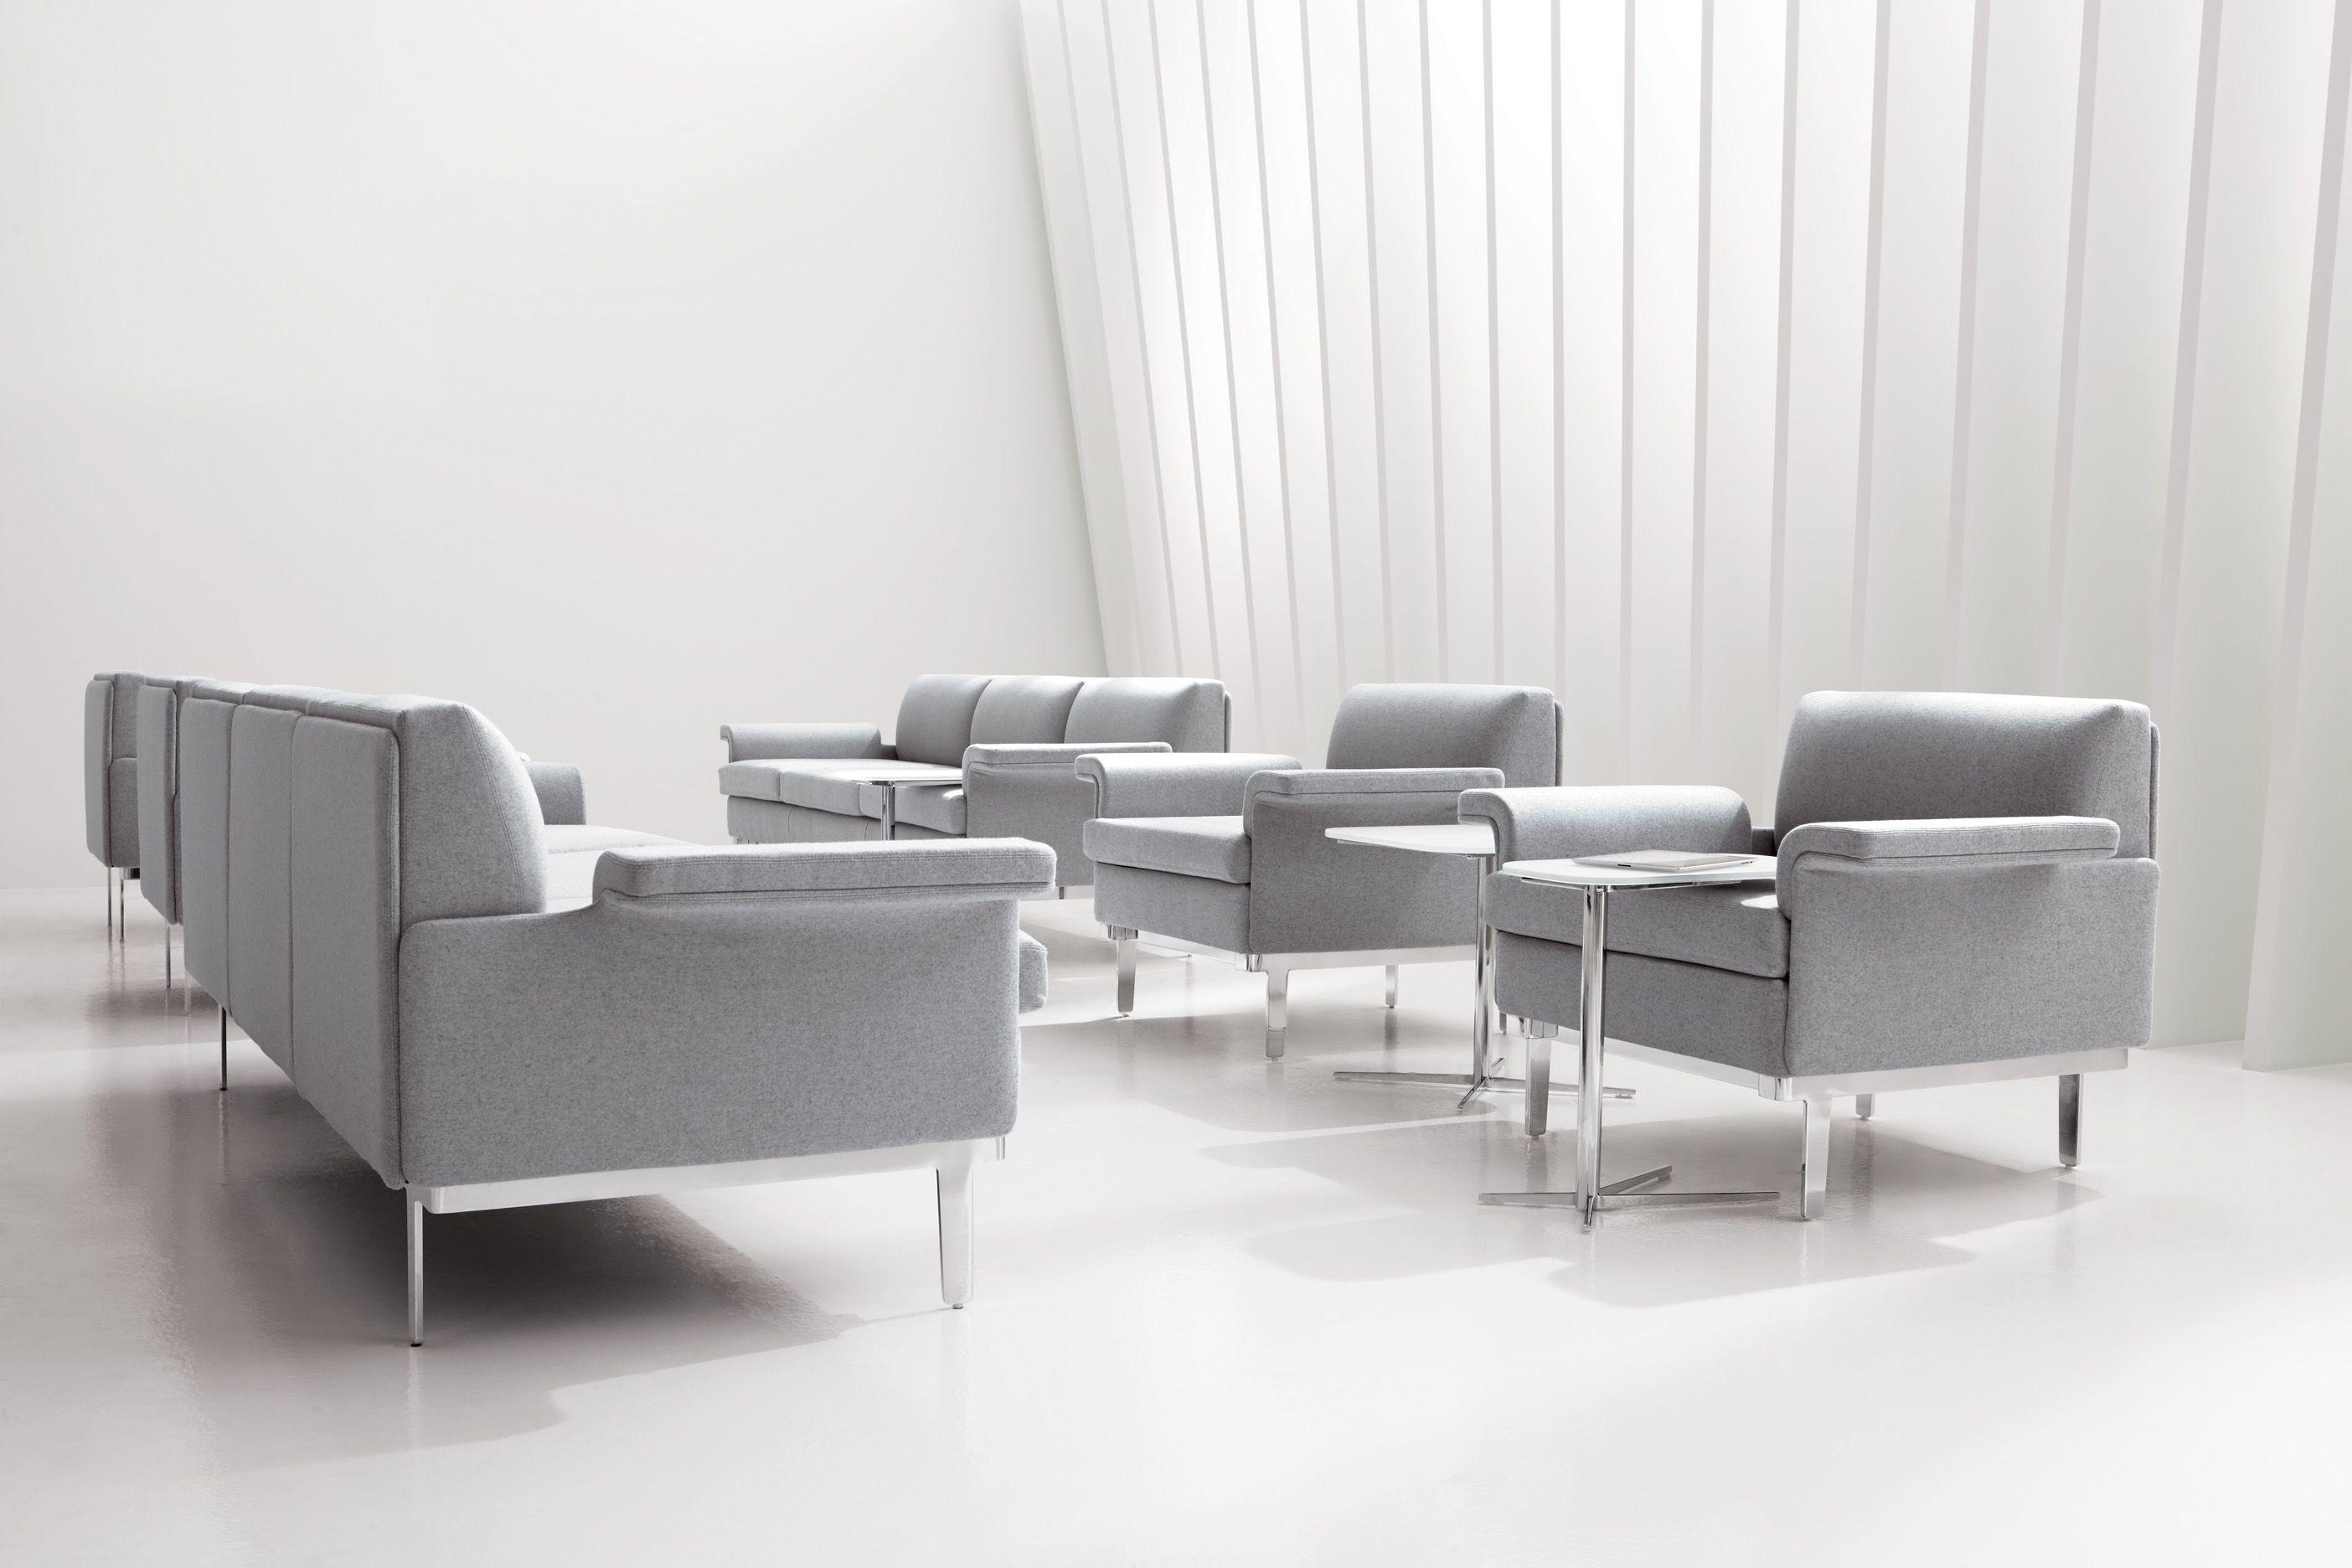 Tremendous Created By Mario Ruiz For Studio Tk The Series Of Lounge Ibusinesslaw Wood Chair Design Ideas Ibusinesslaworg